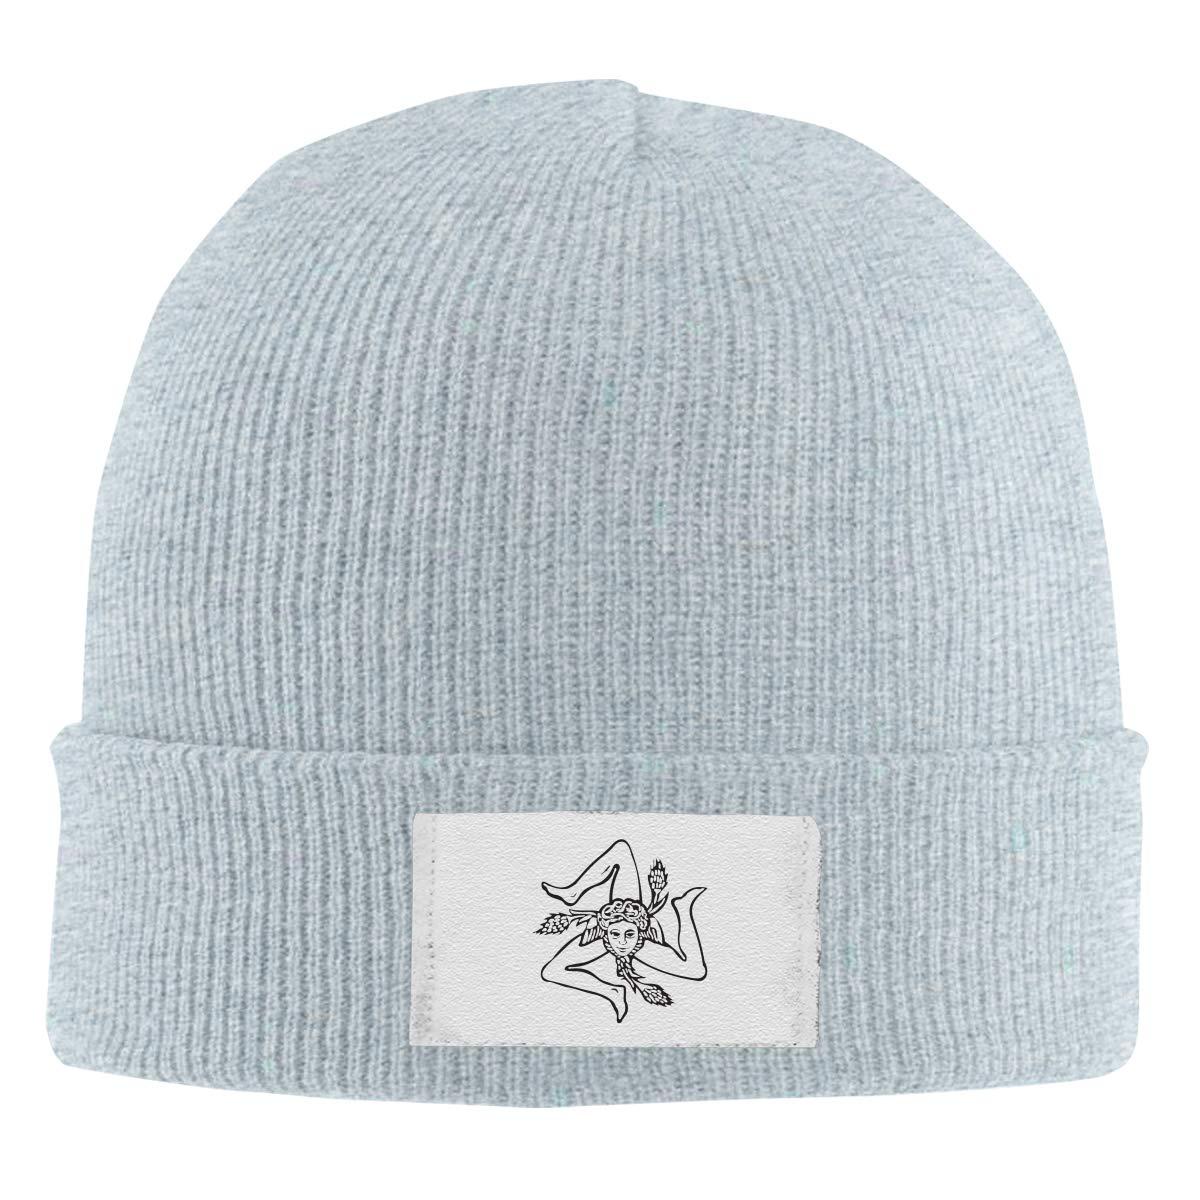 Stretchy Cuff Beanie Hat Black Dunpaiaa Skull Caps Sicilian Trinacria Logo Winter Warm Knit Hats